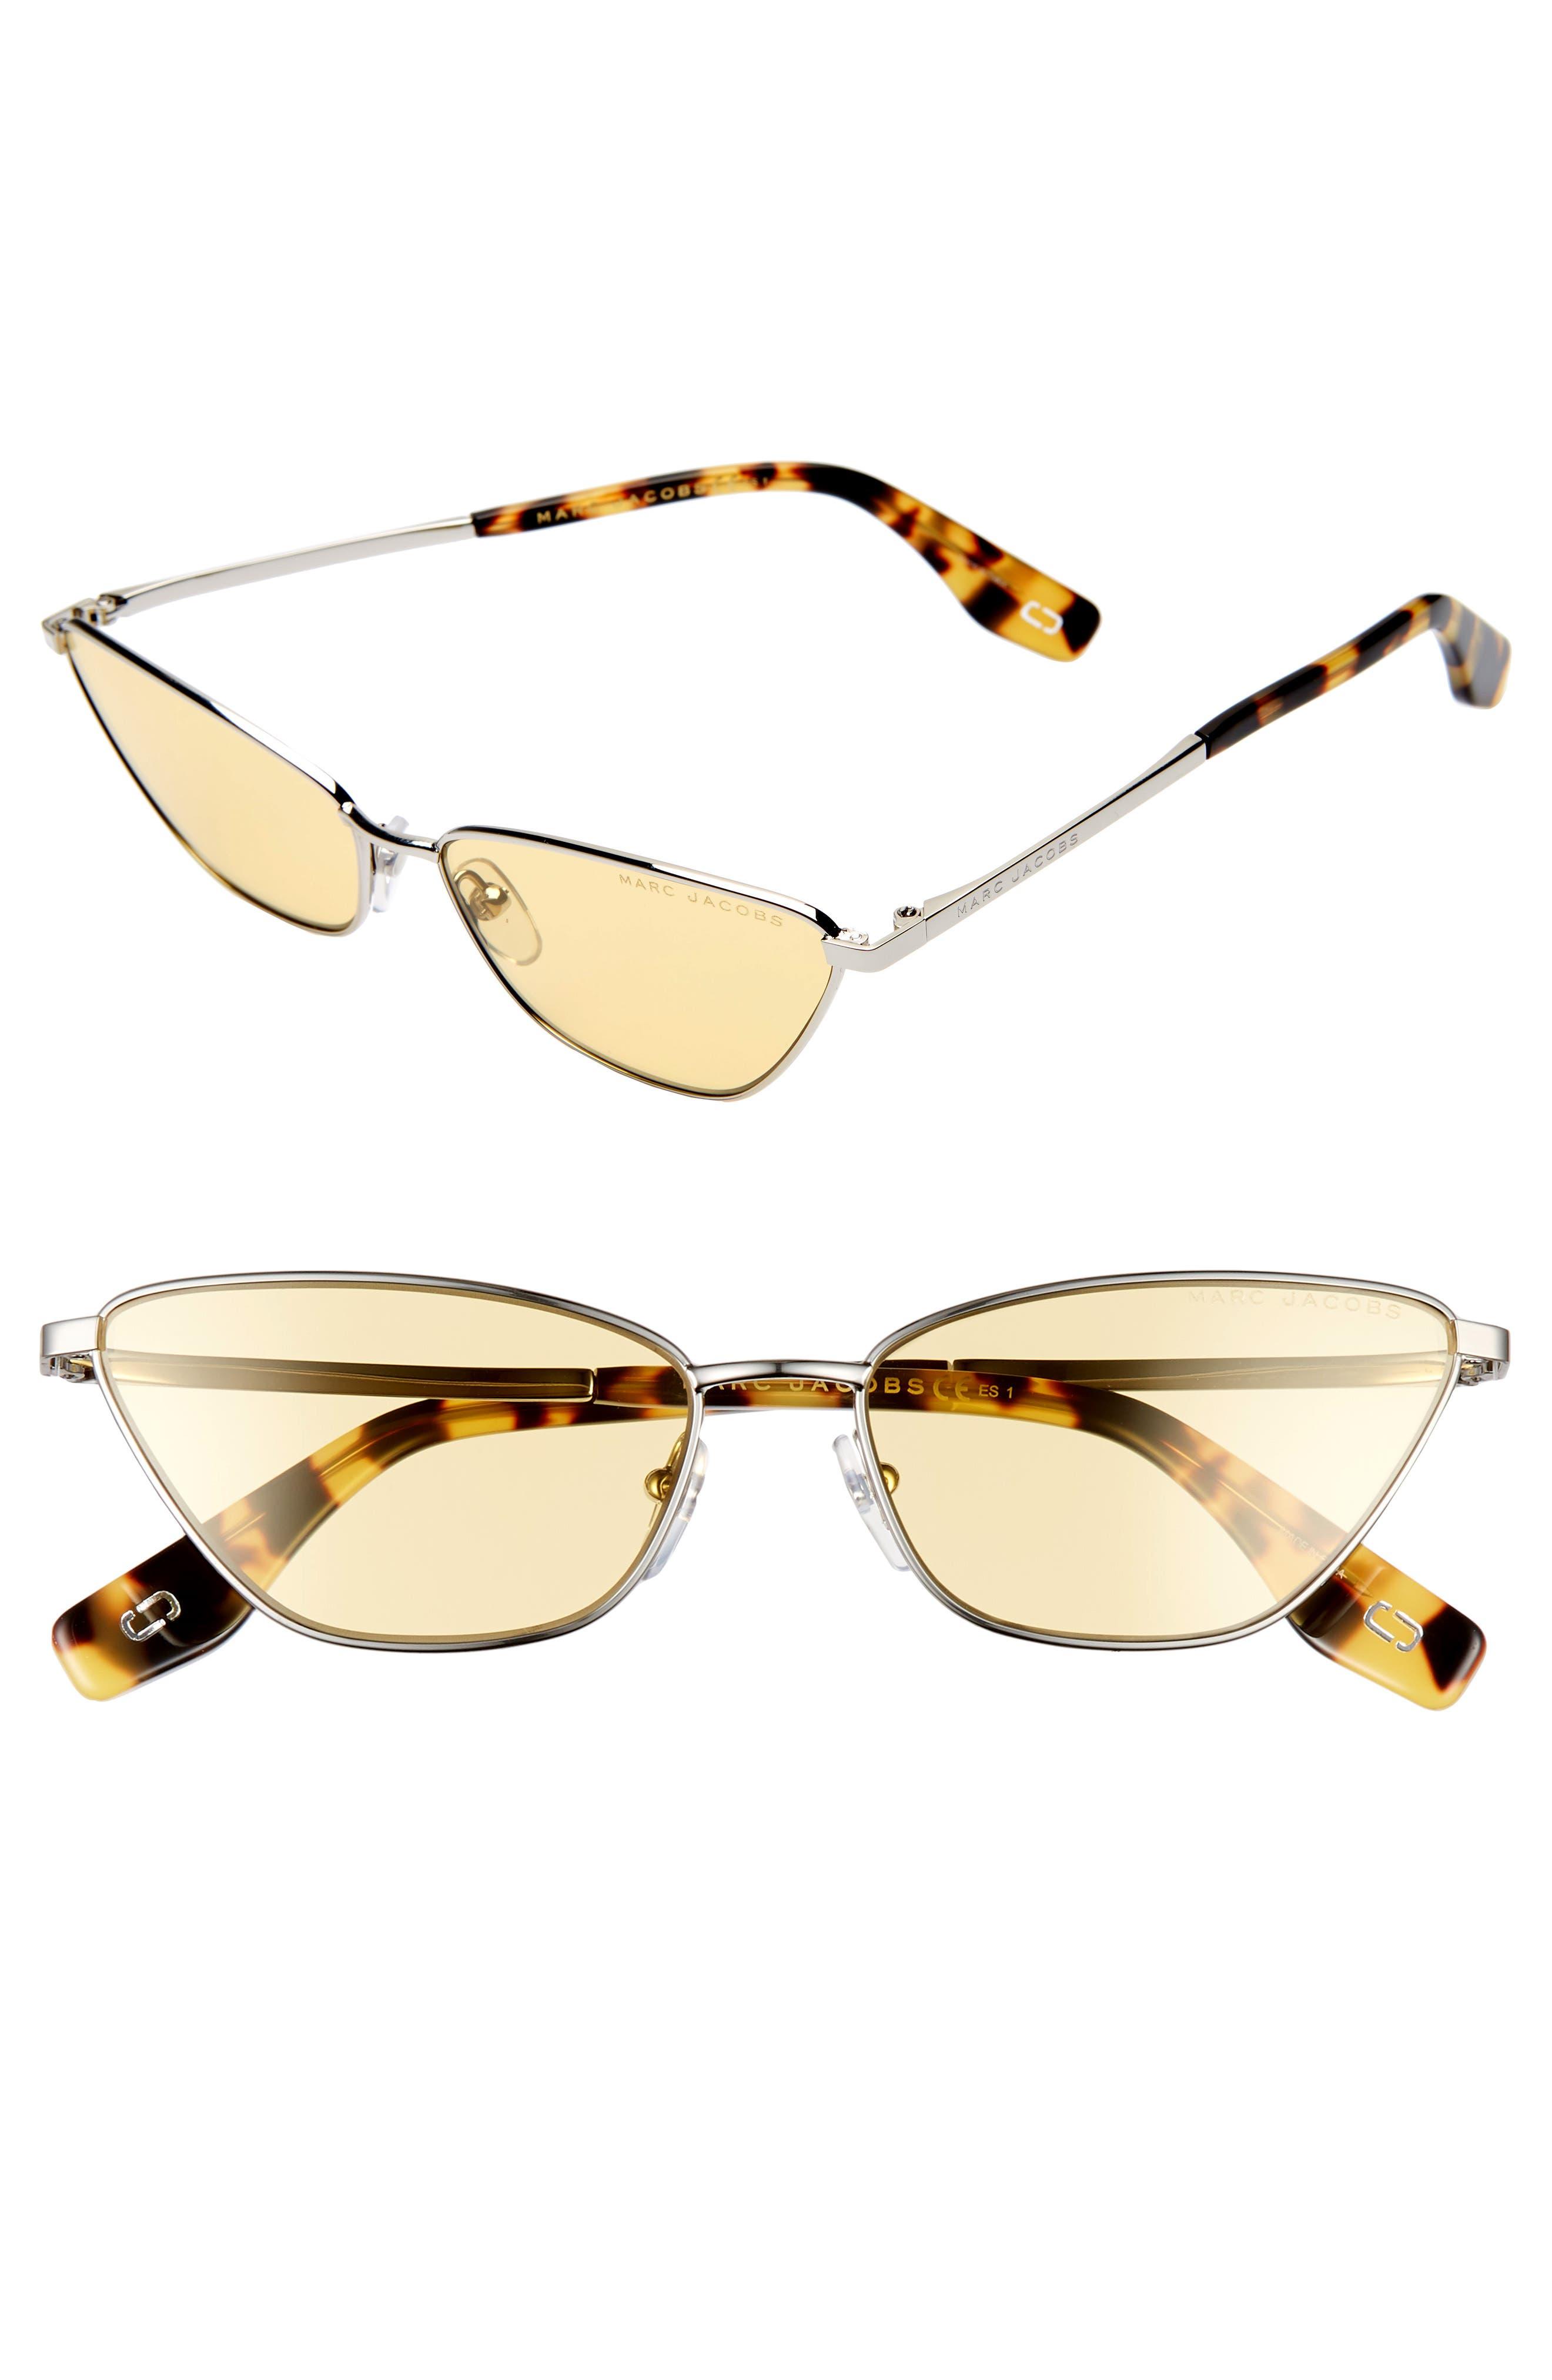 57mm Cat Eye Sunglasses,                             Main thumbnail 1, color,                             SILVER/ YELLOW